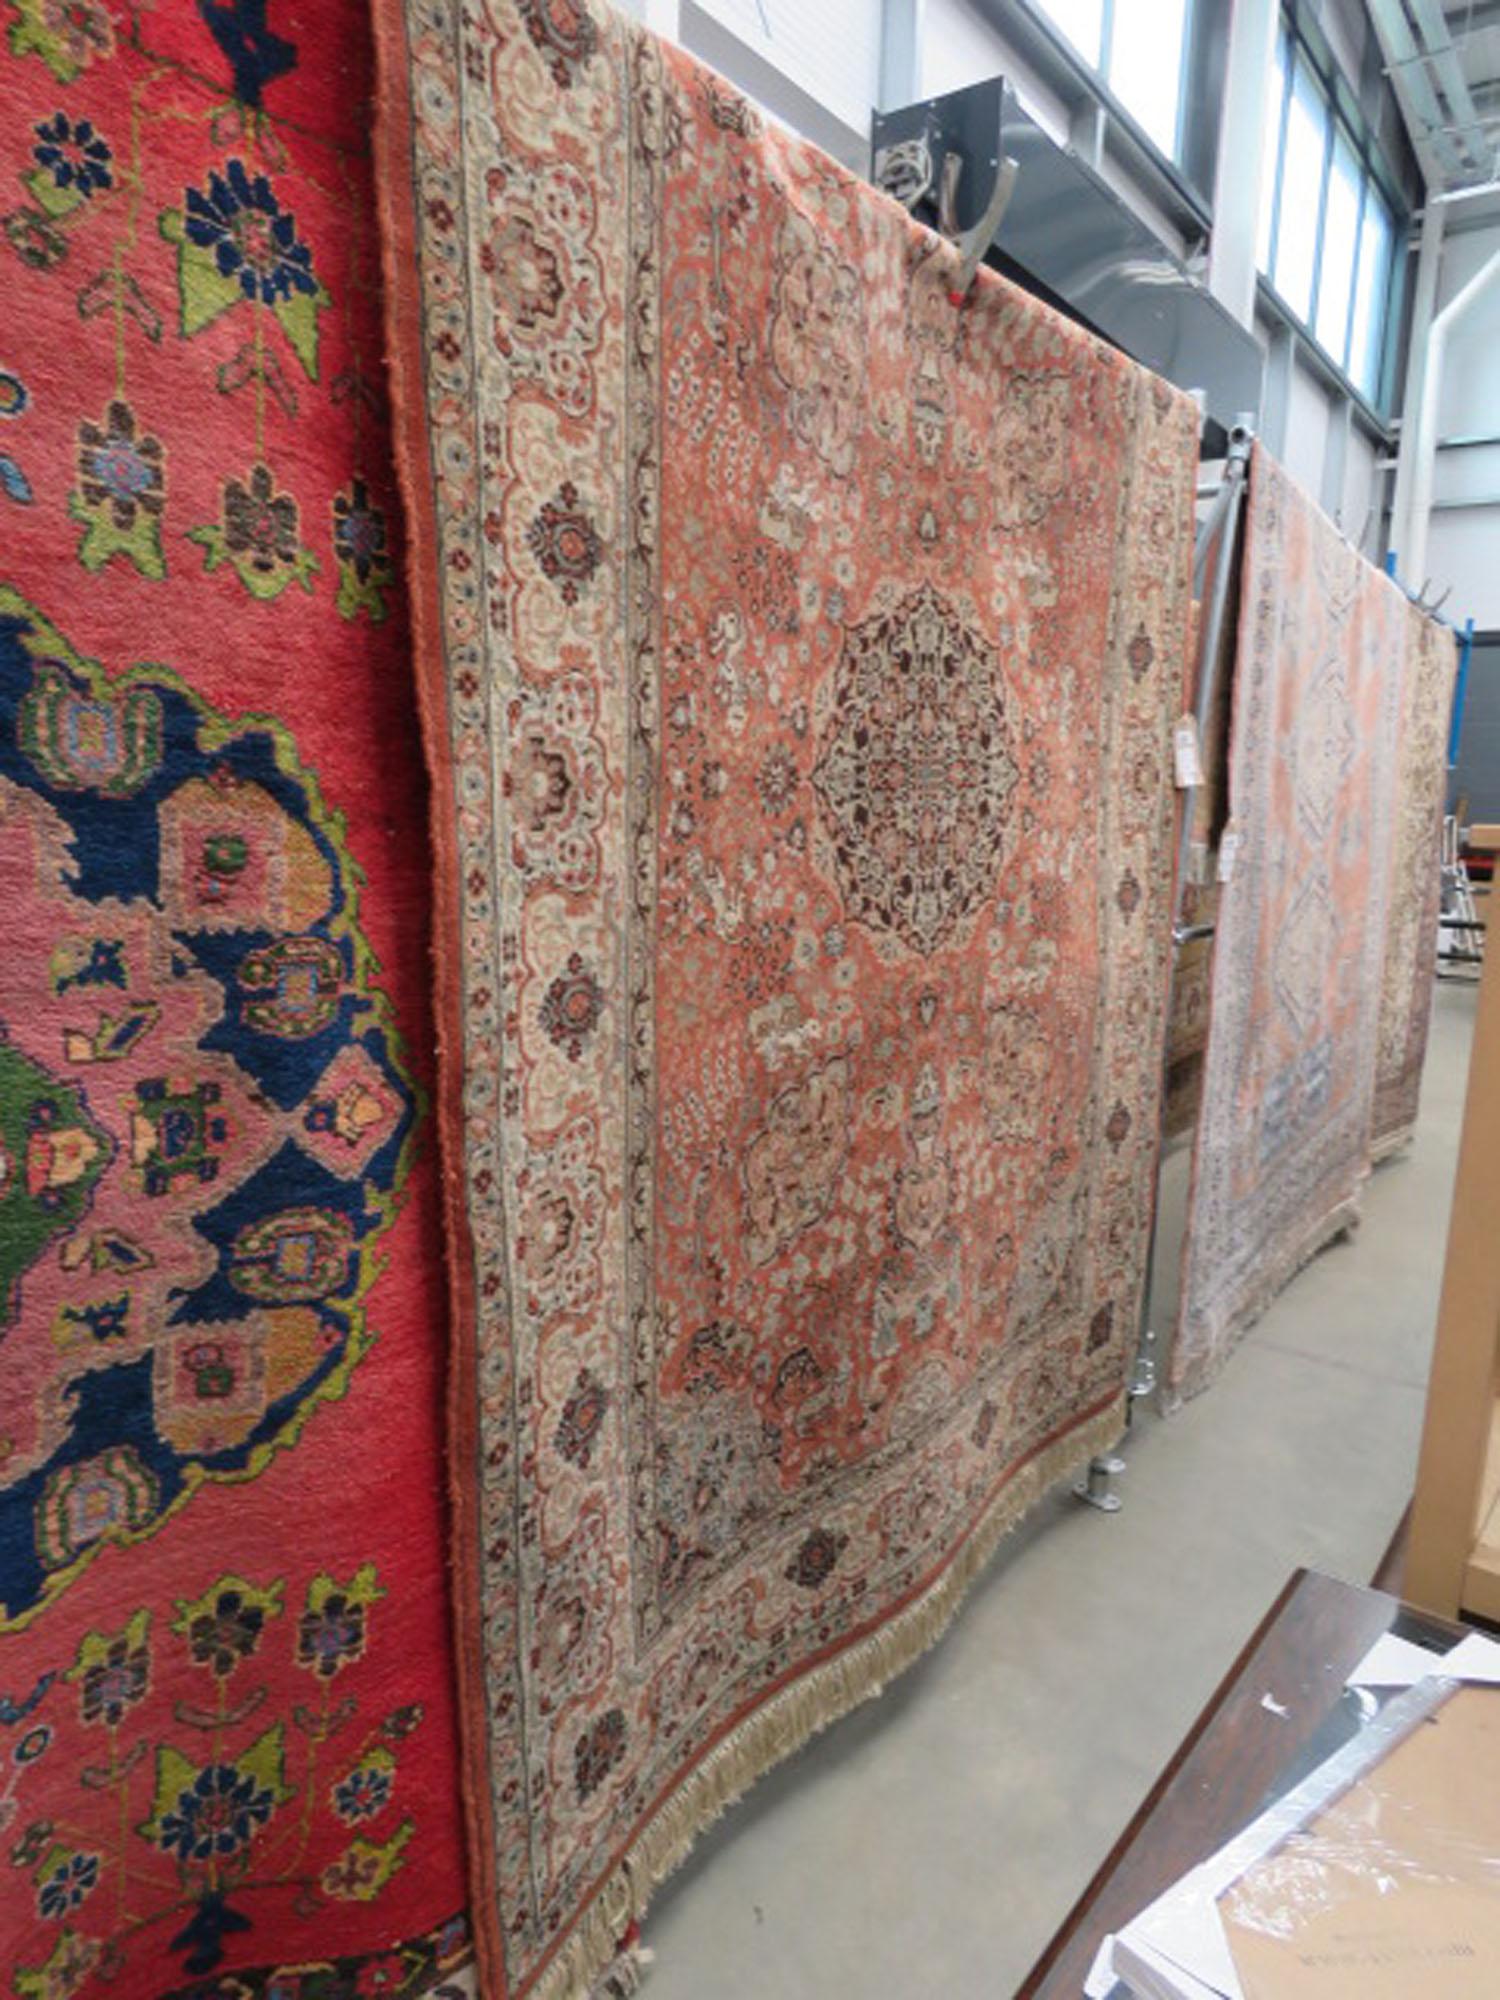 (9) 1.7x2.4m red floral carpet